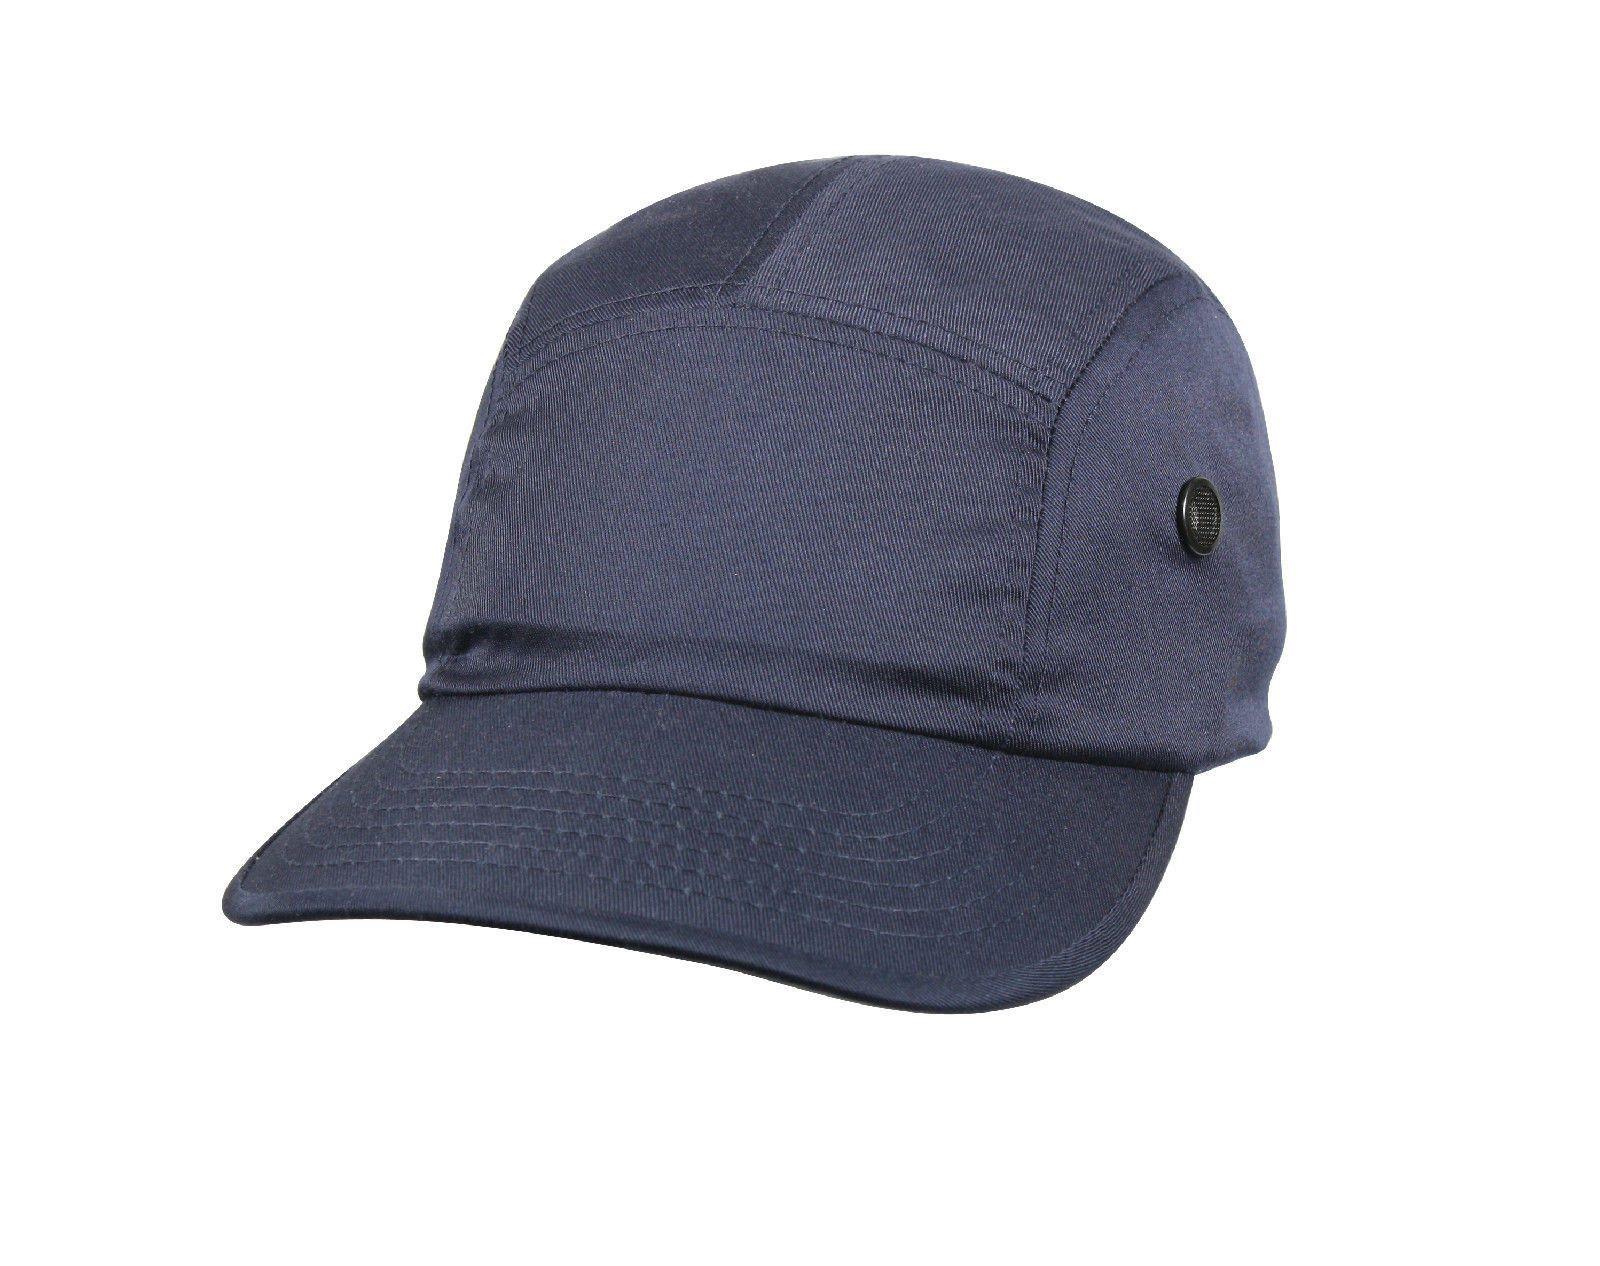 Military Street Caps - Urban Military Hats - Black d88a351c6346